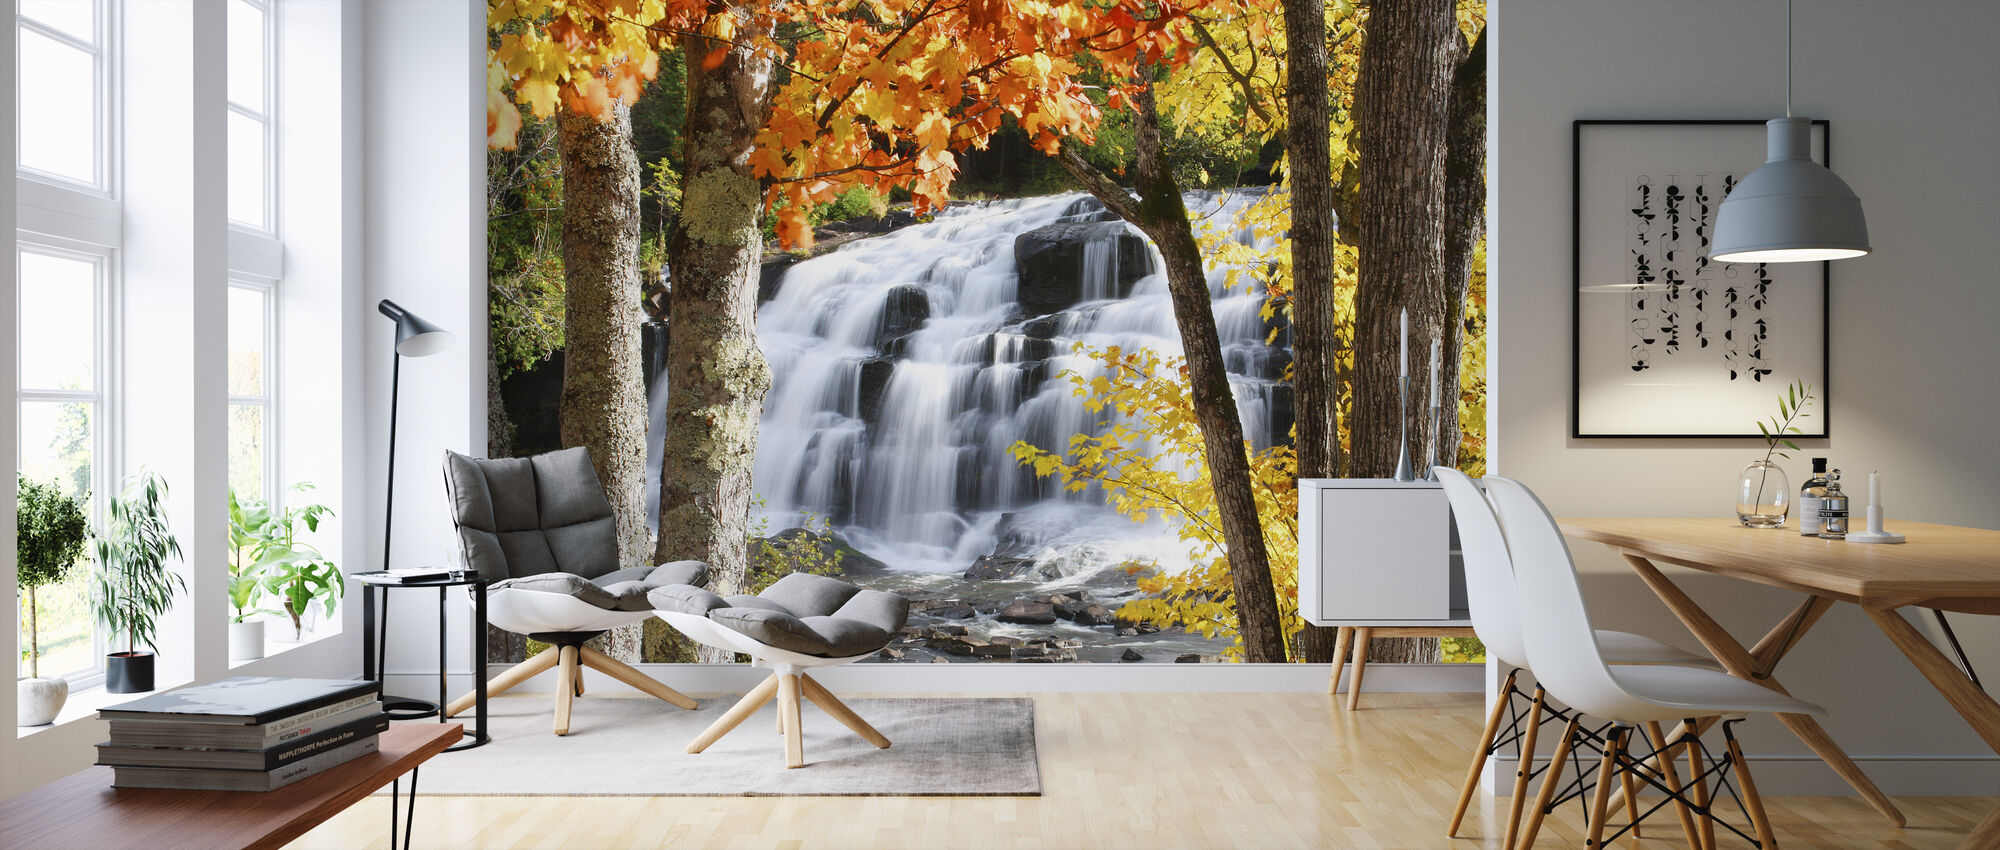 Bond Falls dressed in Autumn colors - Wallpaper - Living Room